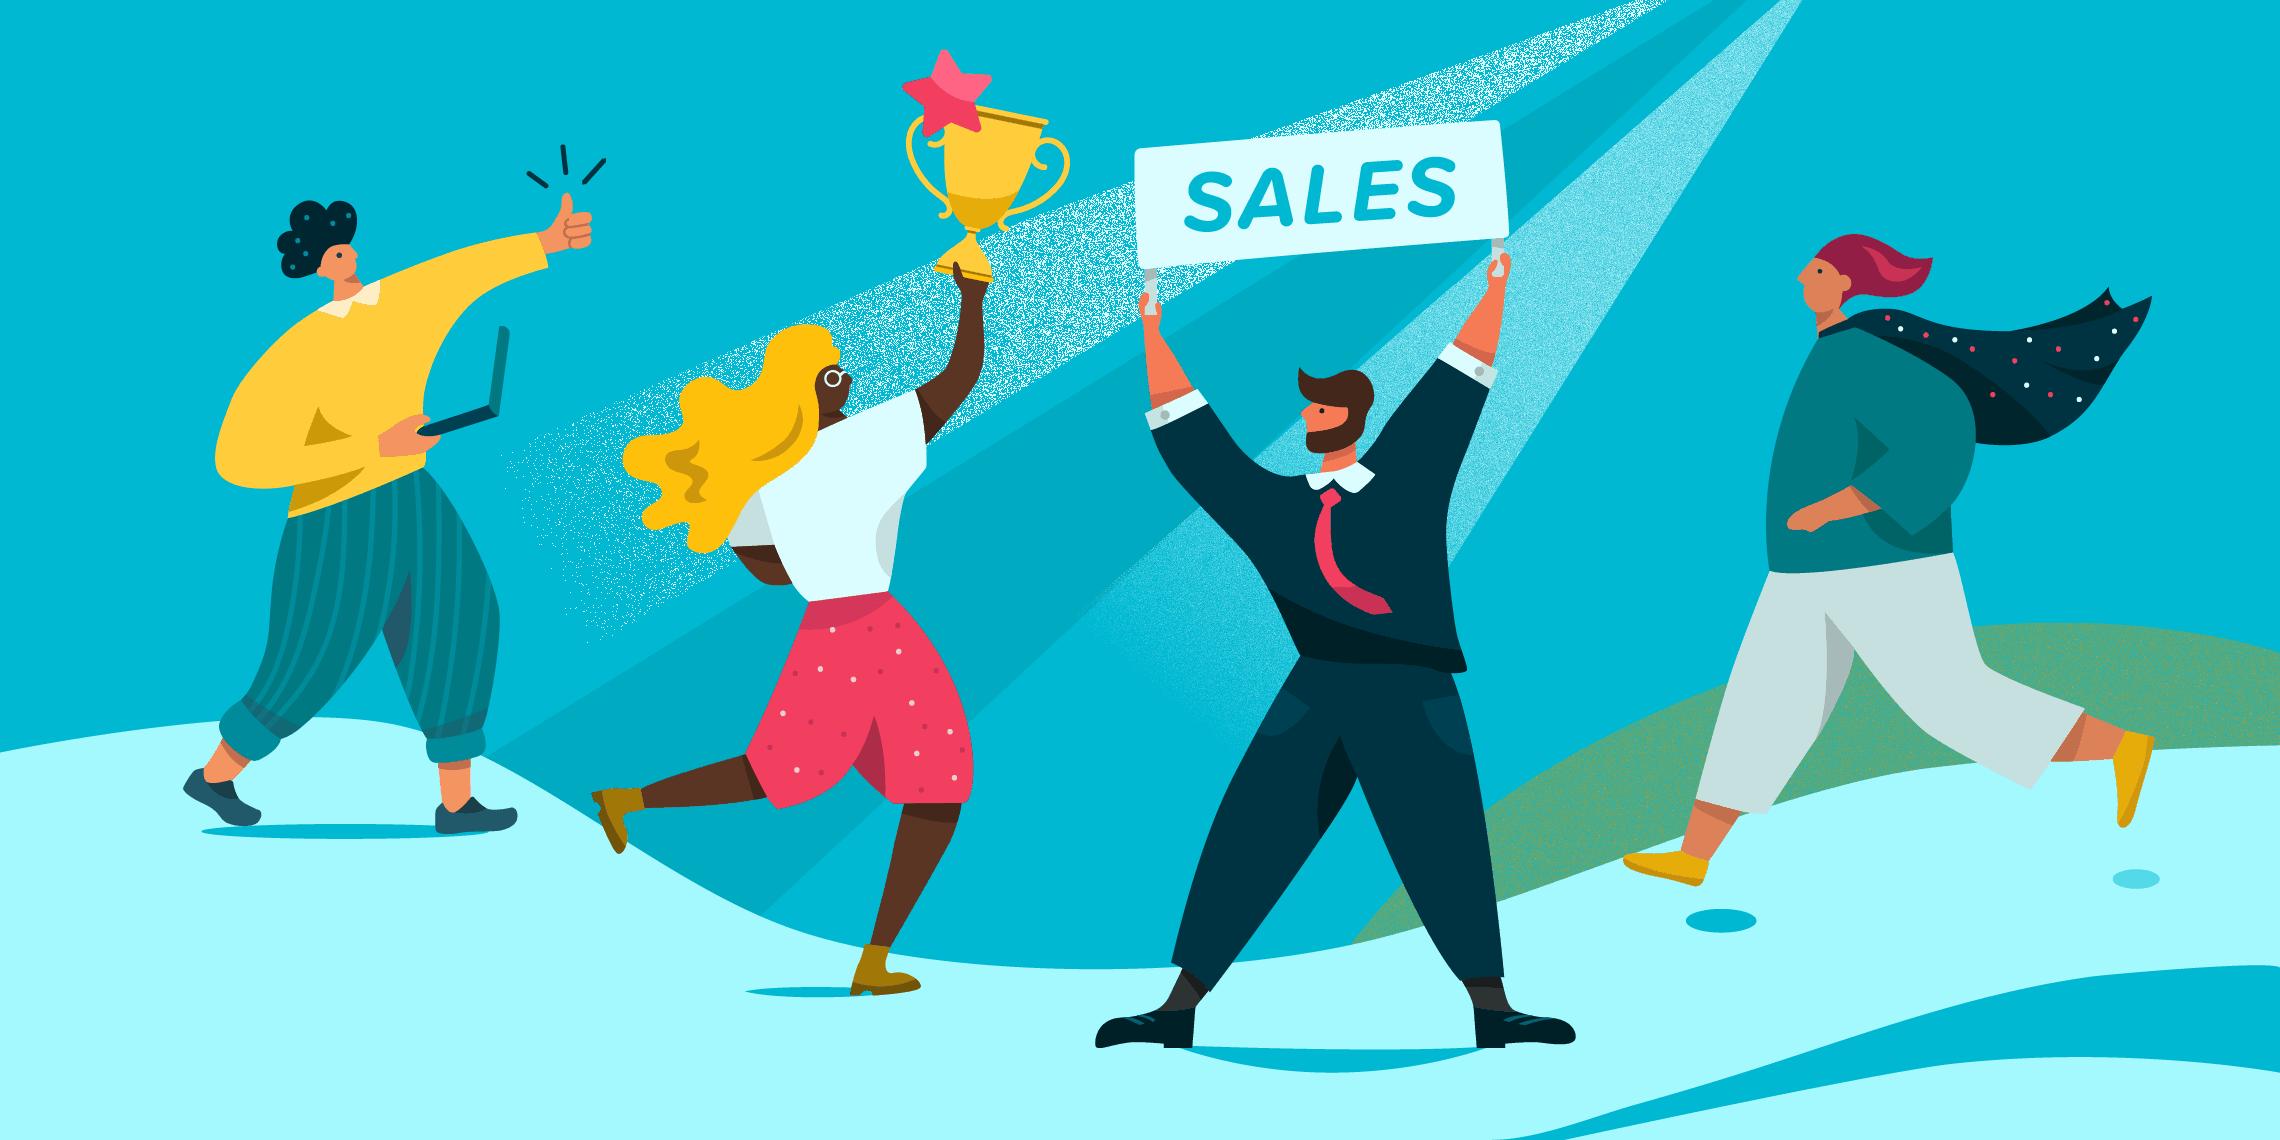 Motivate your sales team